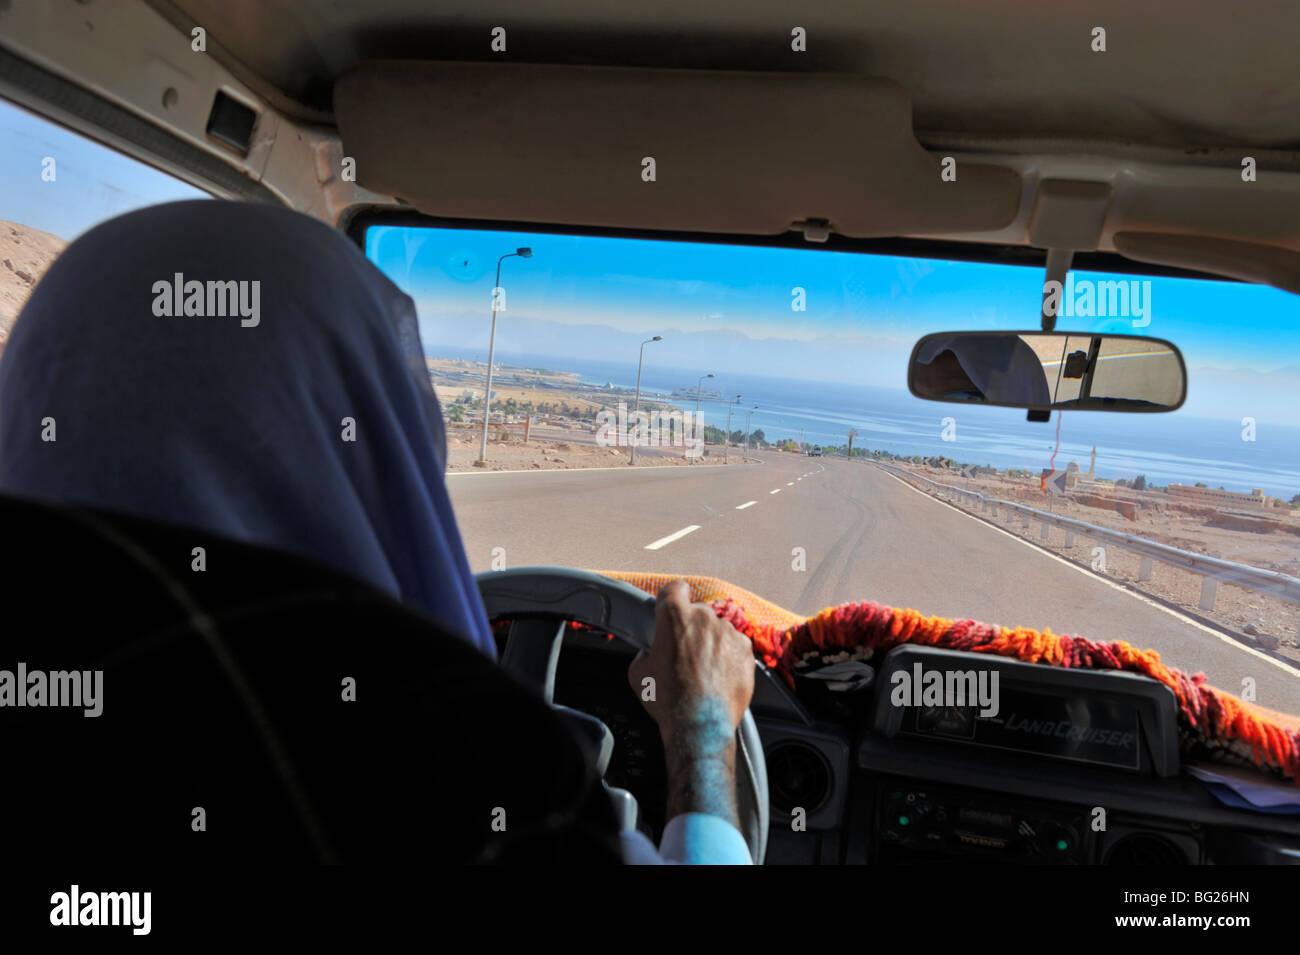 Bedouin Arab driving into Nuweiba, South Sinai peninsula, Egypt - Stock Image